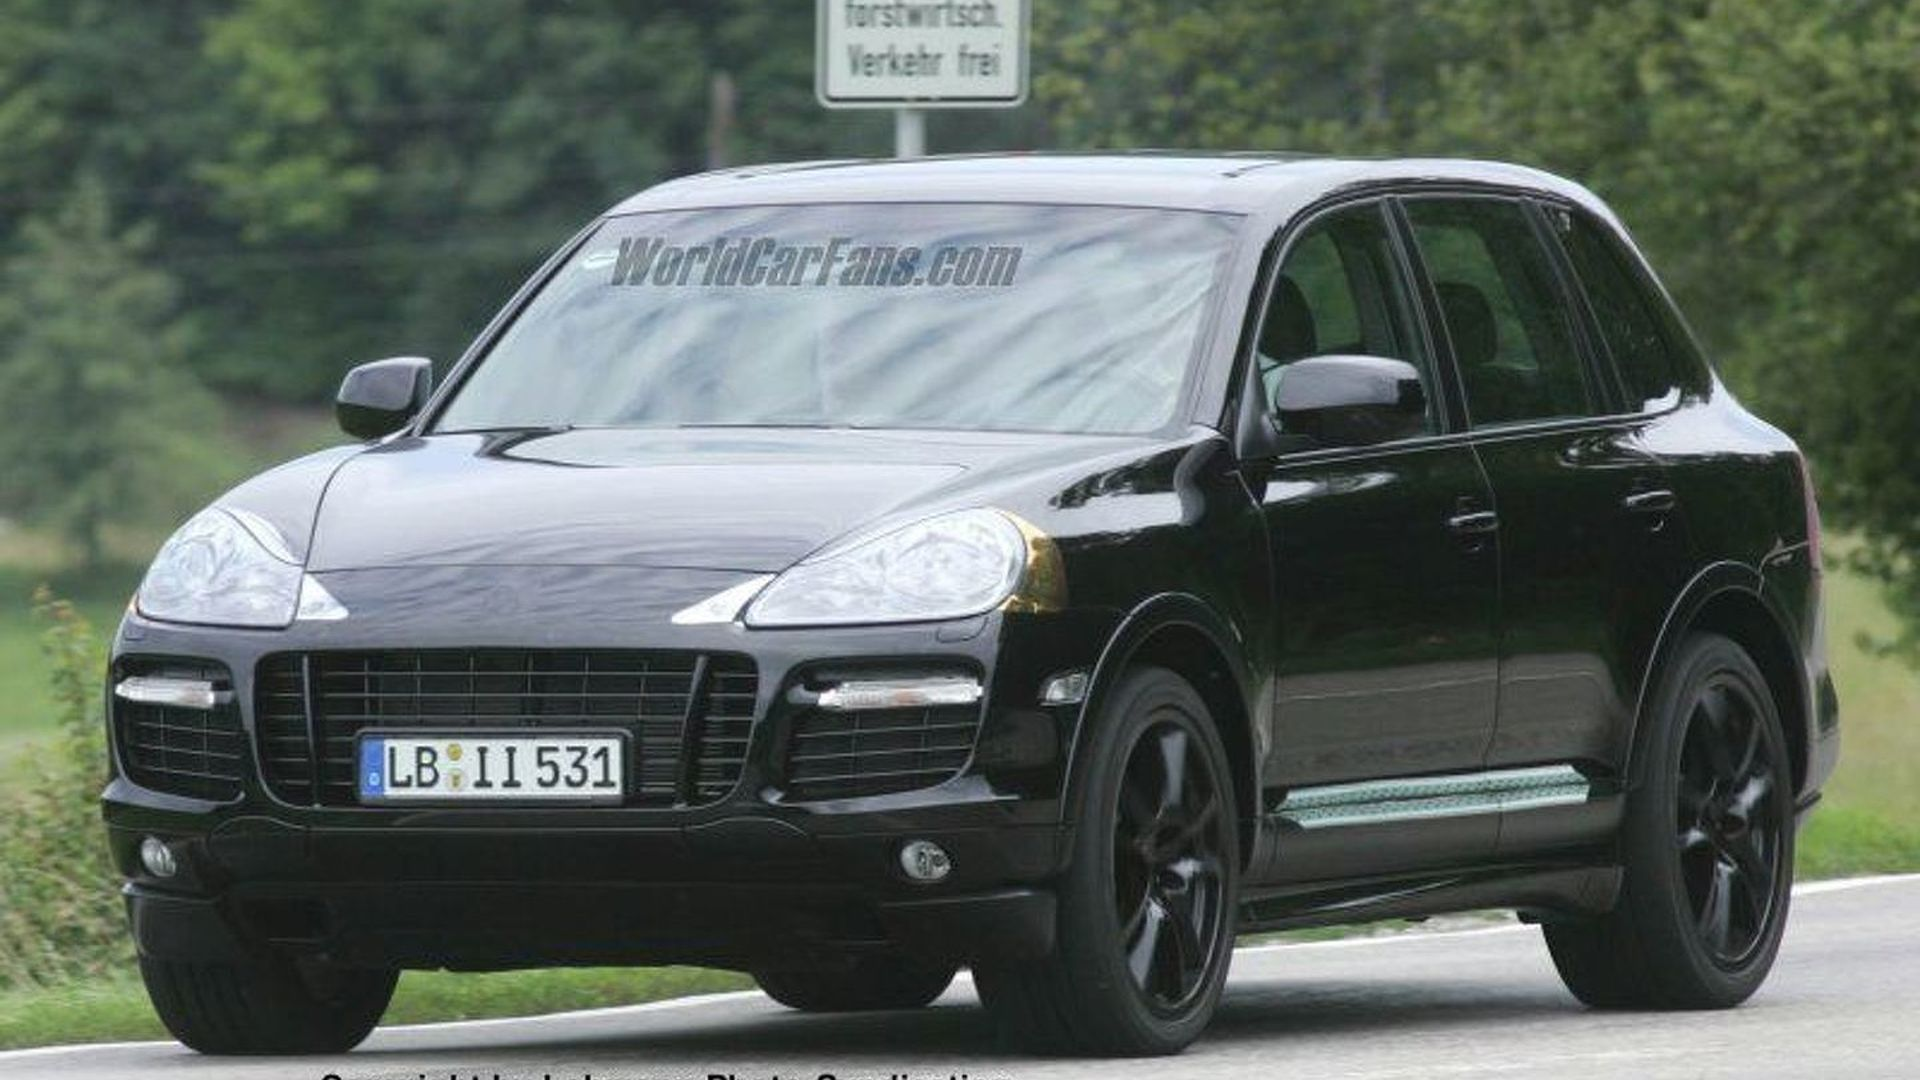 SPY PHOTOS: Porsche Cayenne Facelift Uncovered